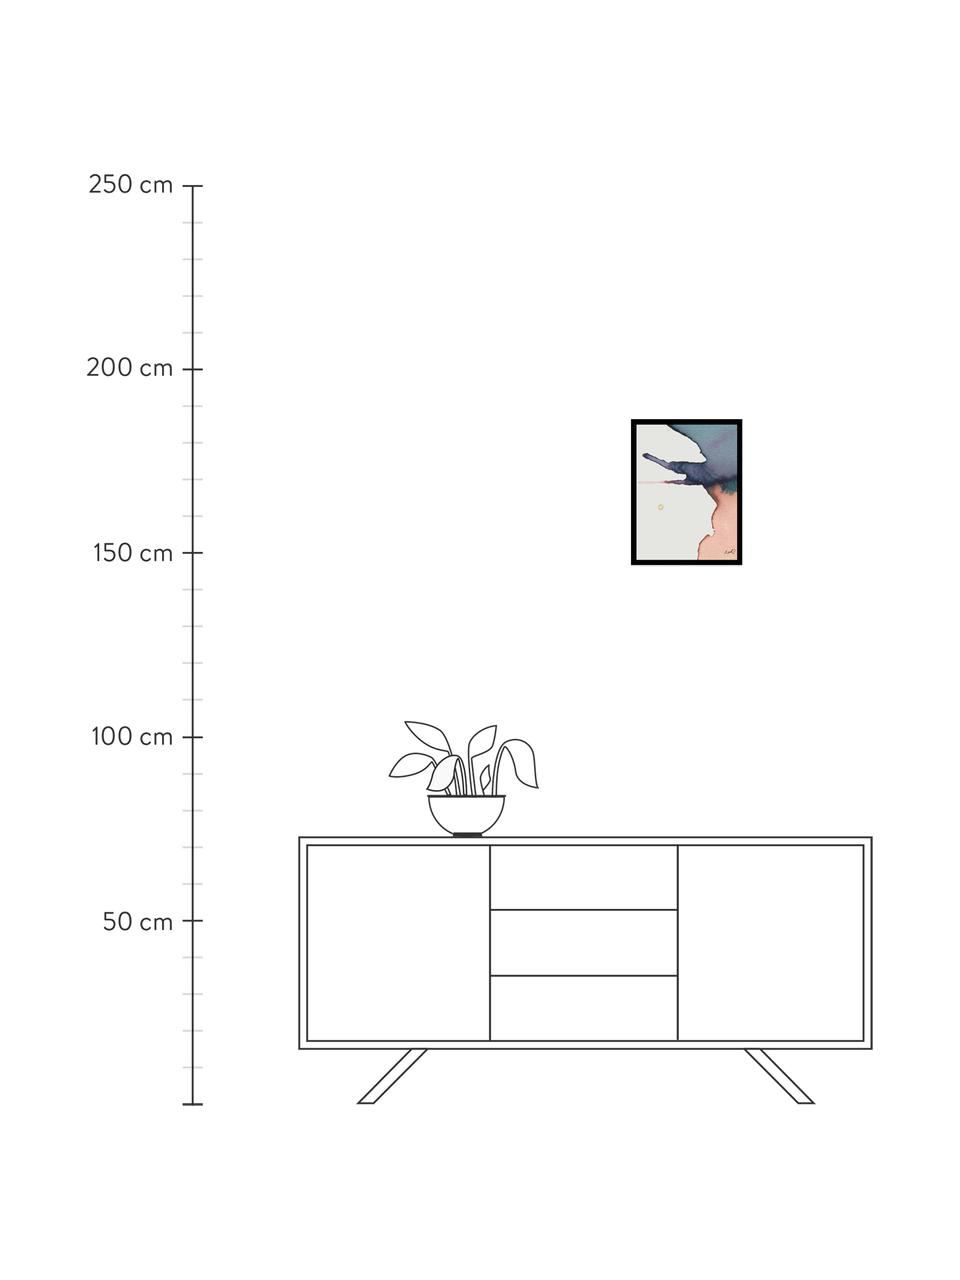 Gerahmter Digitaldruck Paint II, Bild: Digitaldruck, Rahmen: Kunststoffrahmen mit Glas, Mehrfarbig, 30 x 40 cm